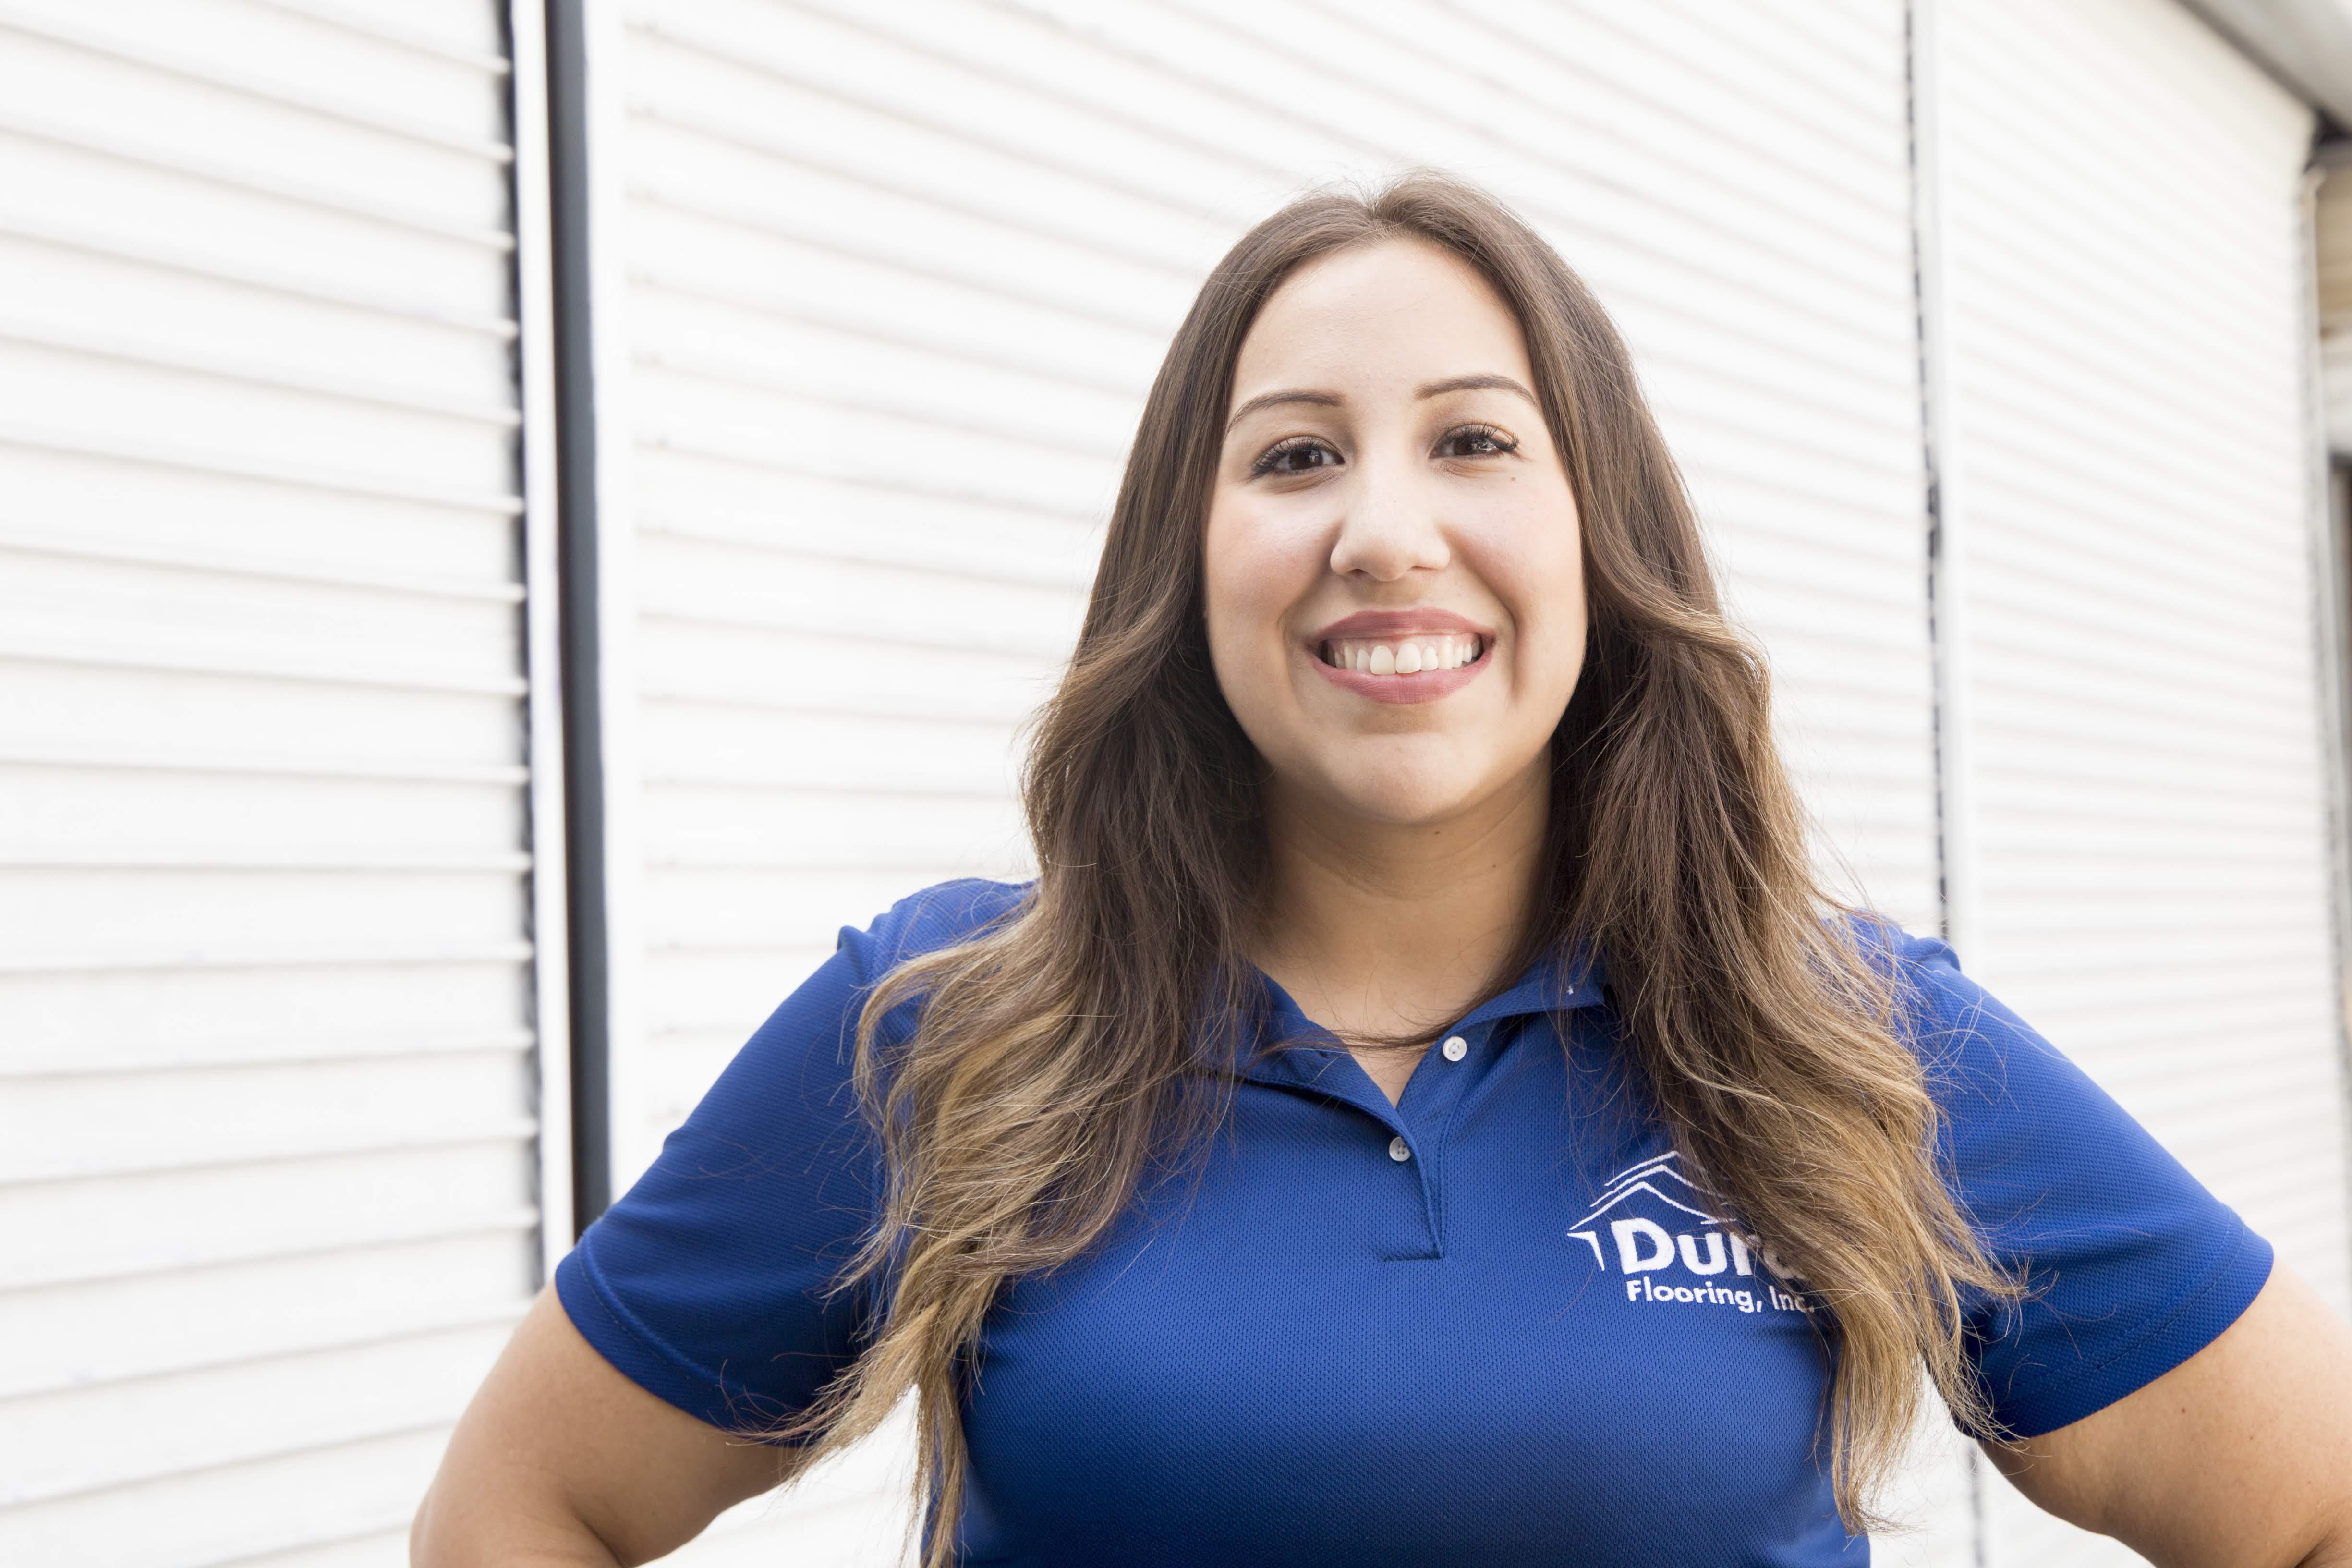 Vanessa, Wholesale Manager at Dura Flooring, Inc